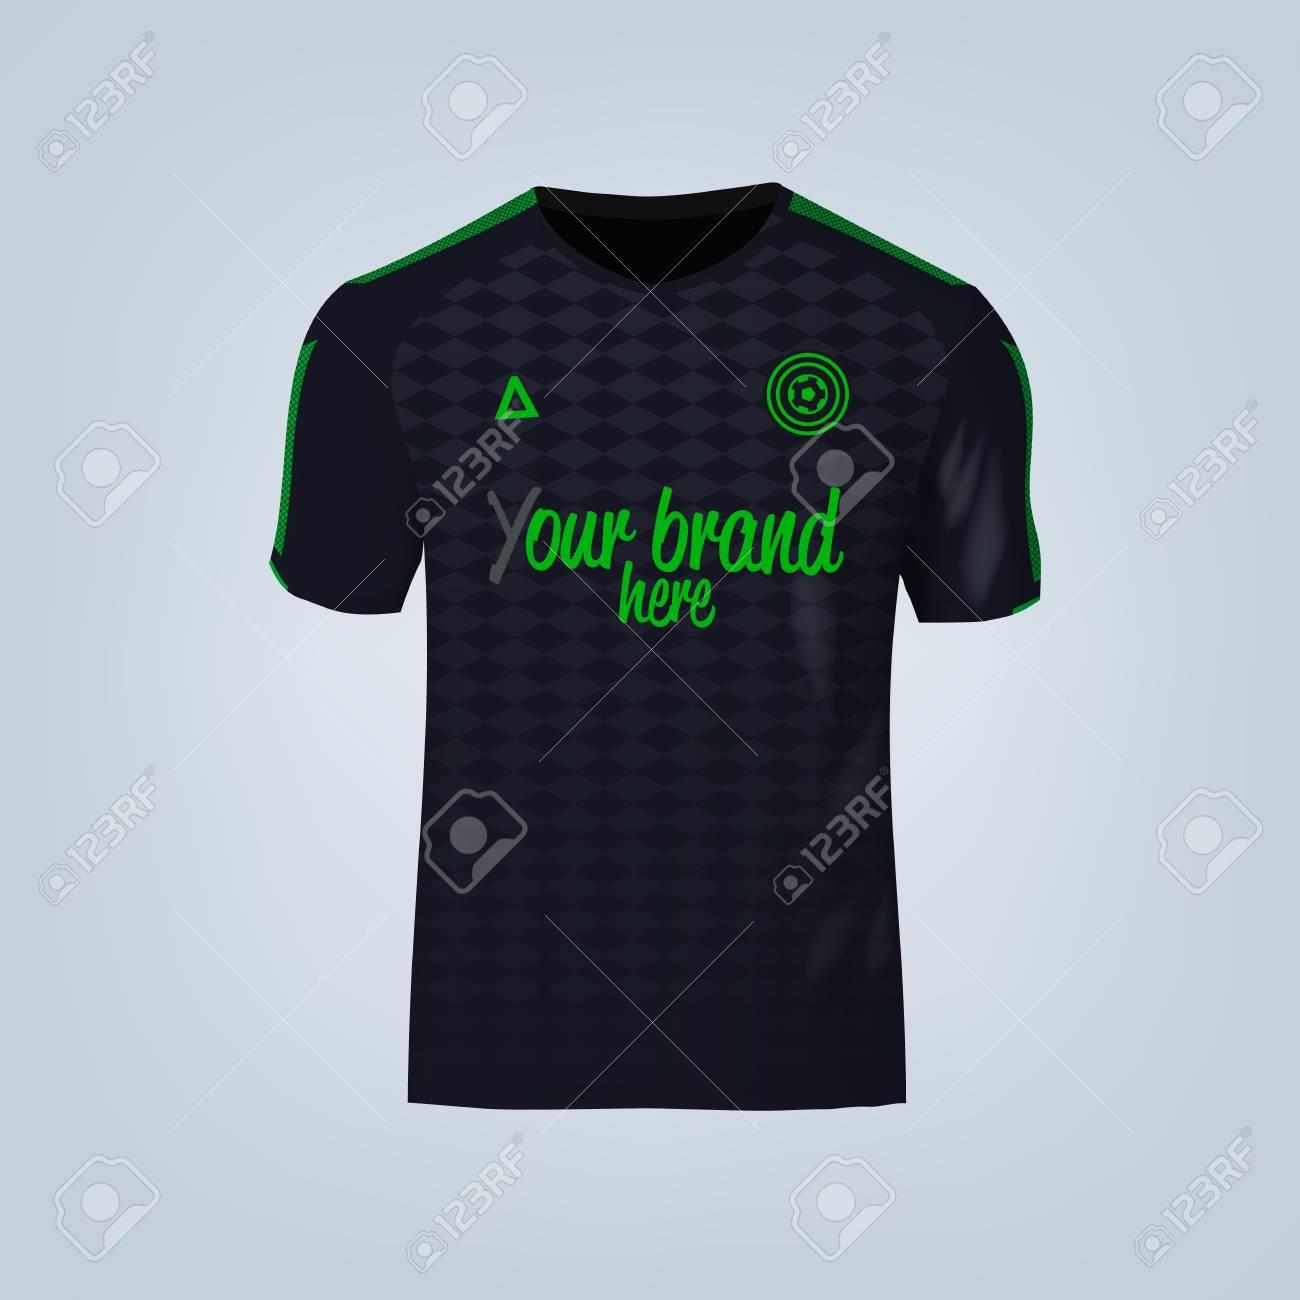 Vector illustration of football t-shirt template. - 84013213